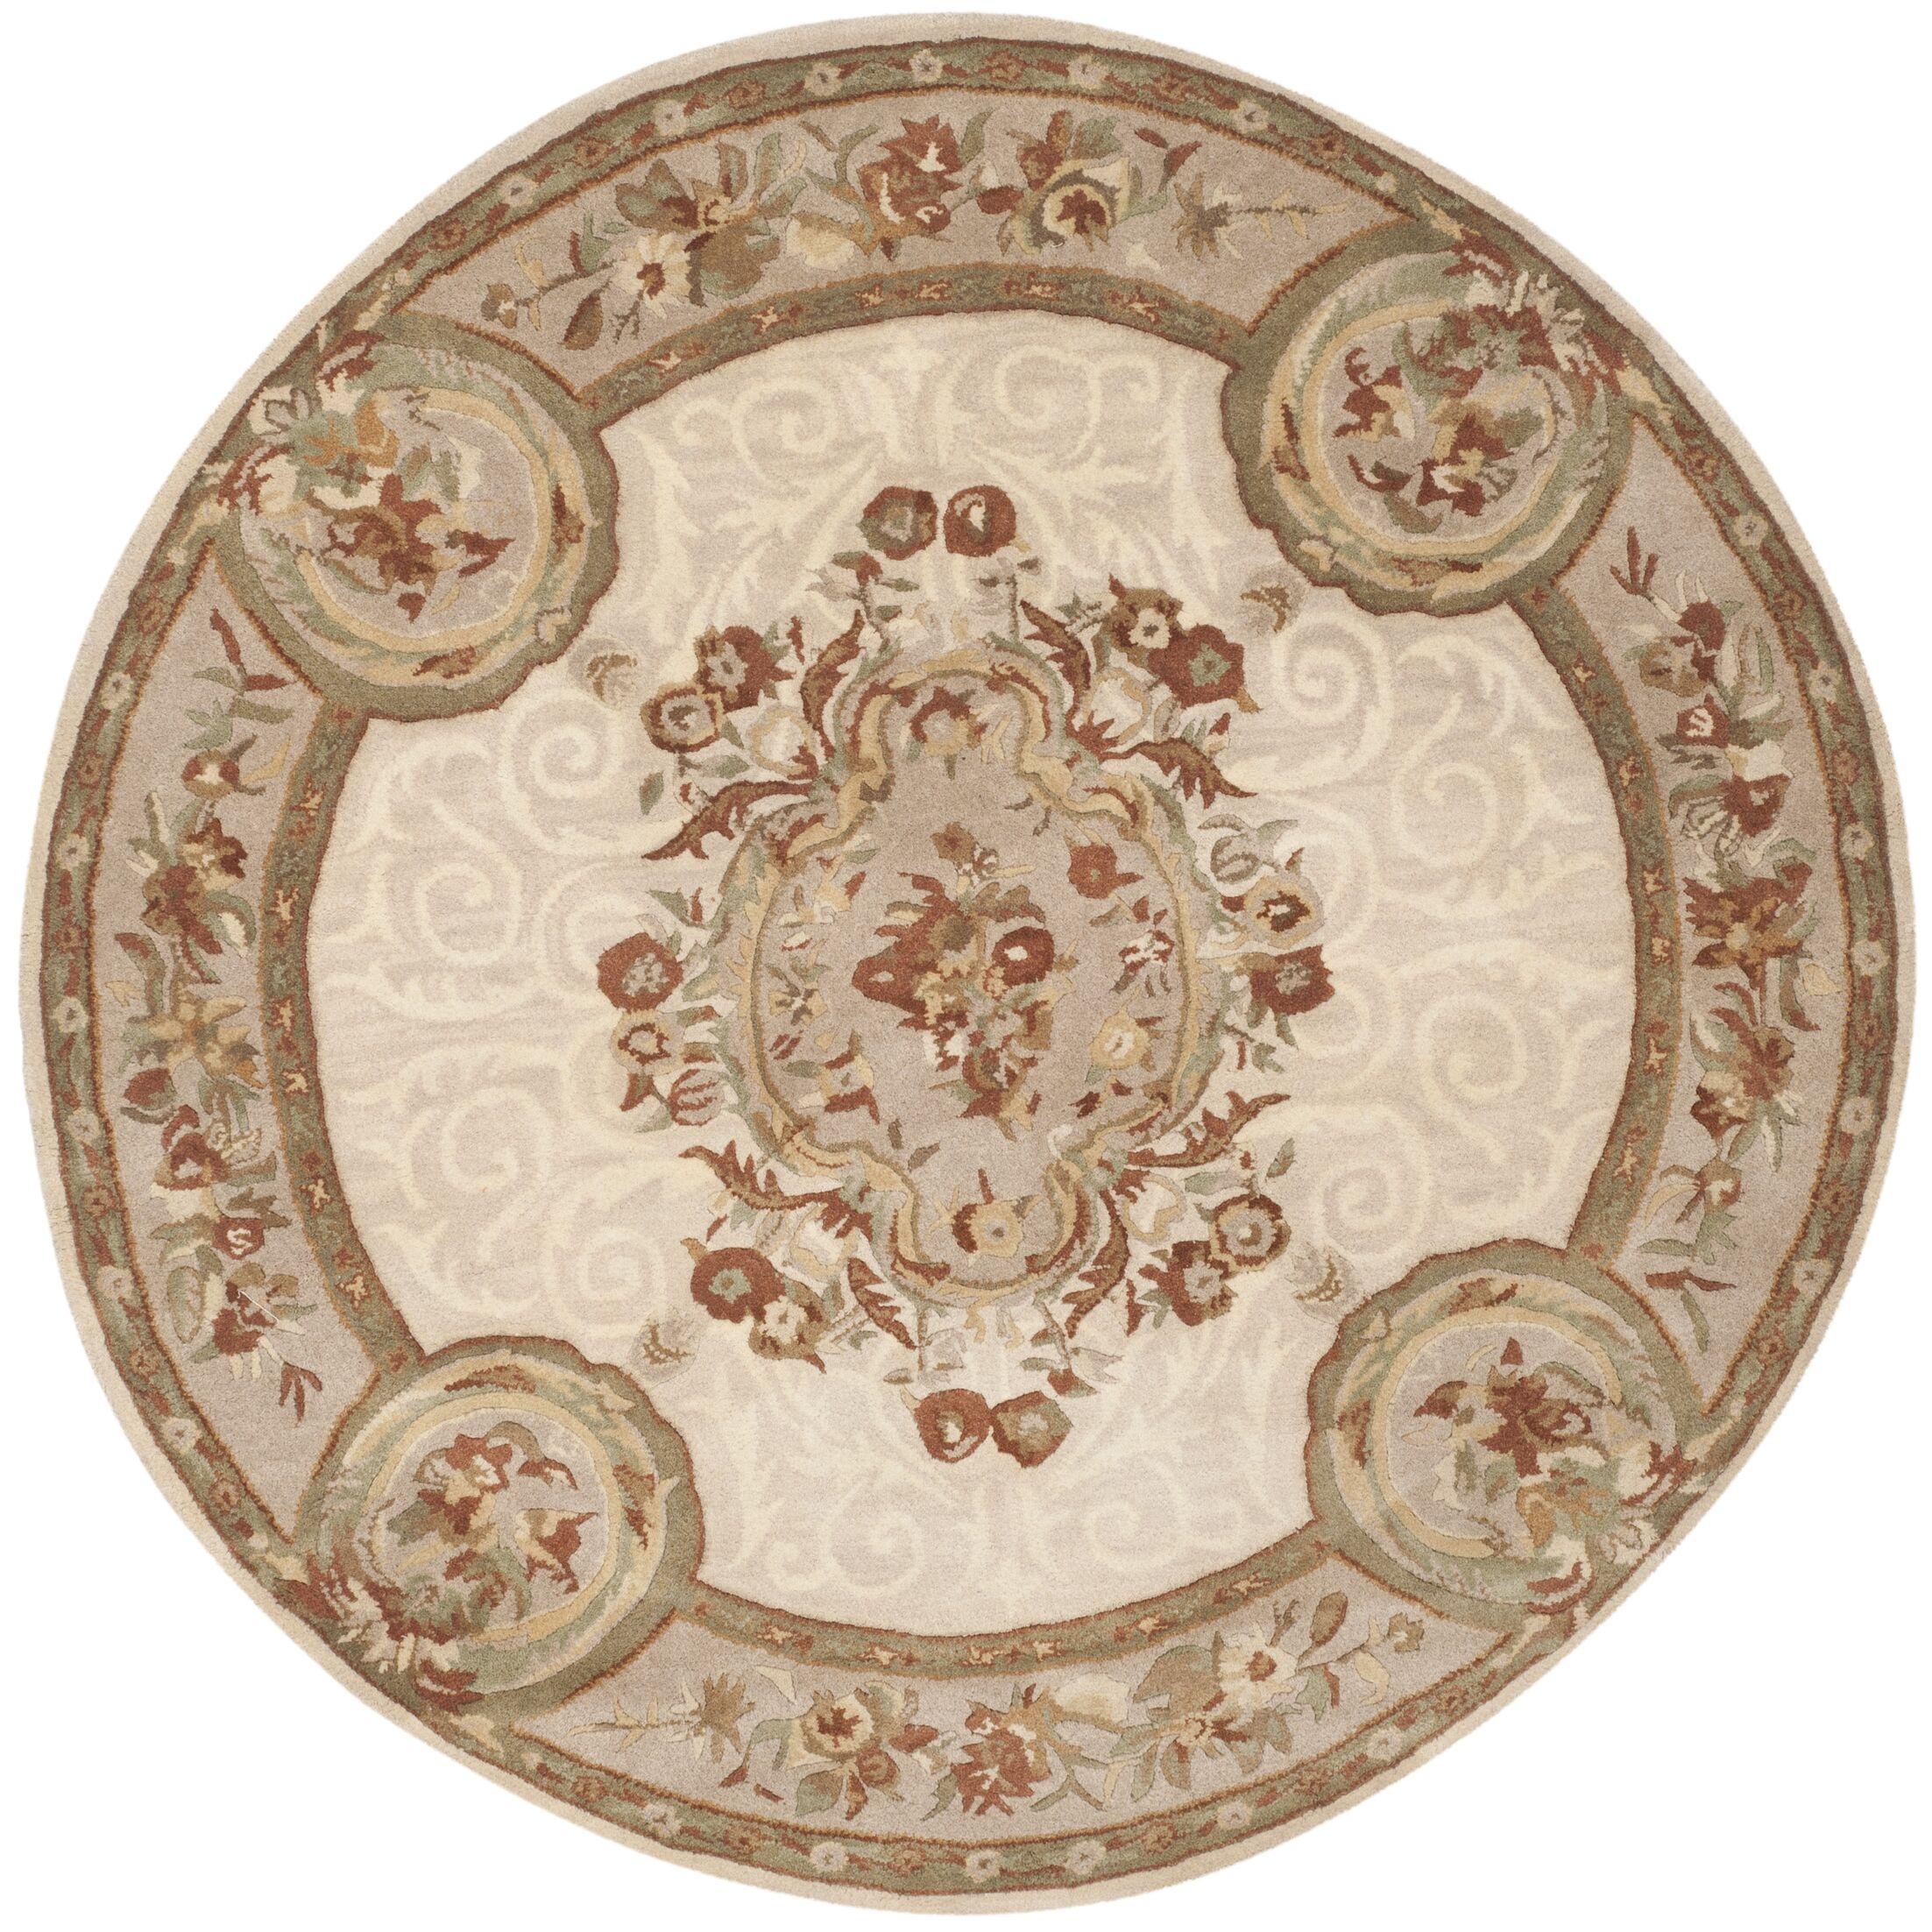 Atlasburg Hand-Tufted Wool Ivory Area Rug Size: Round 3'6